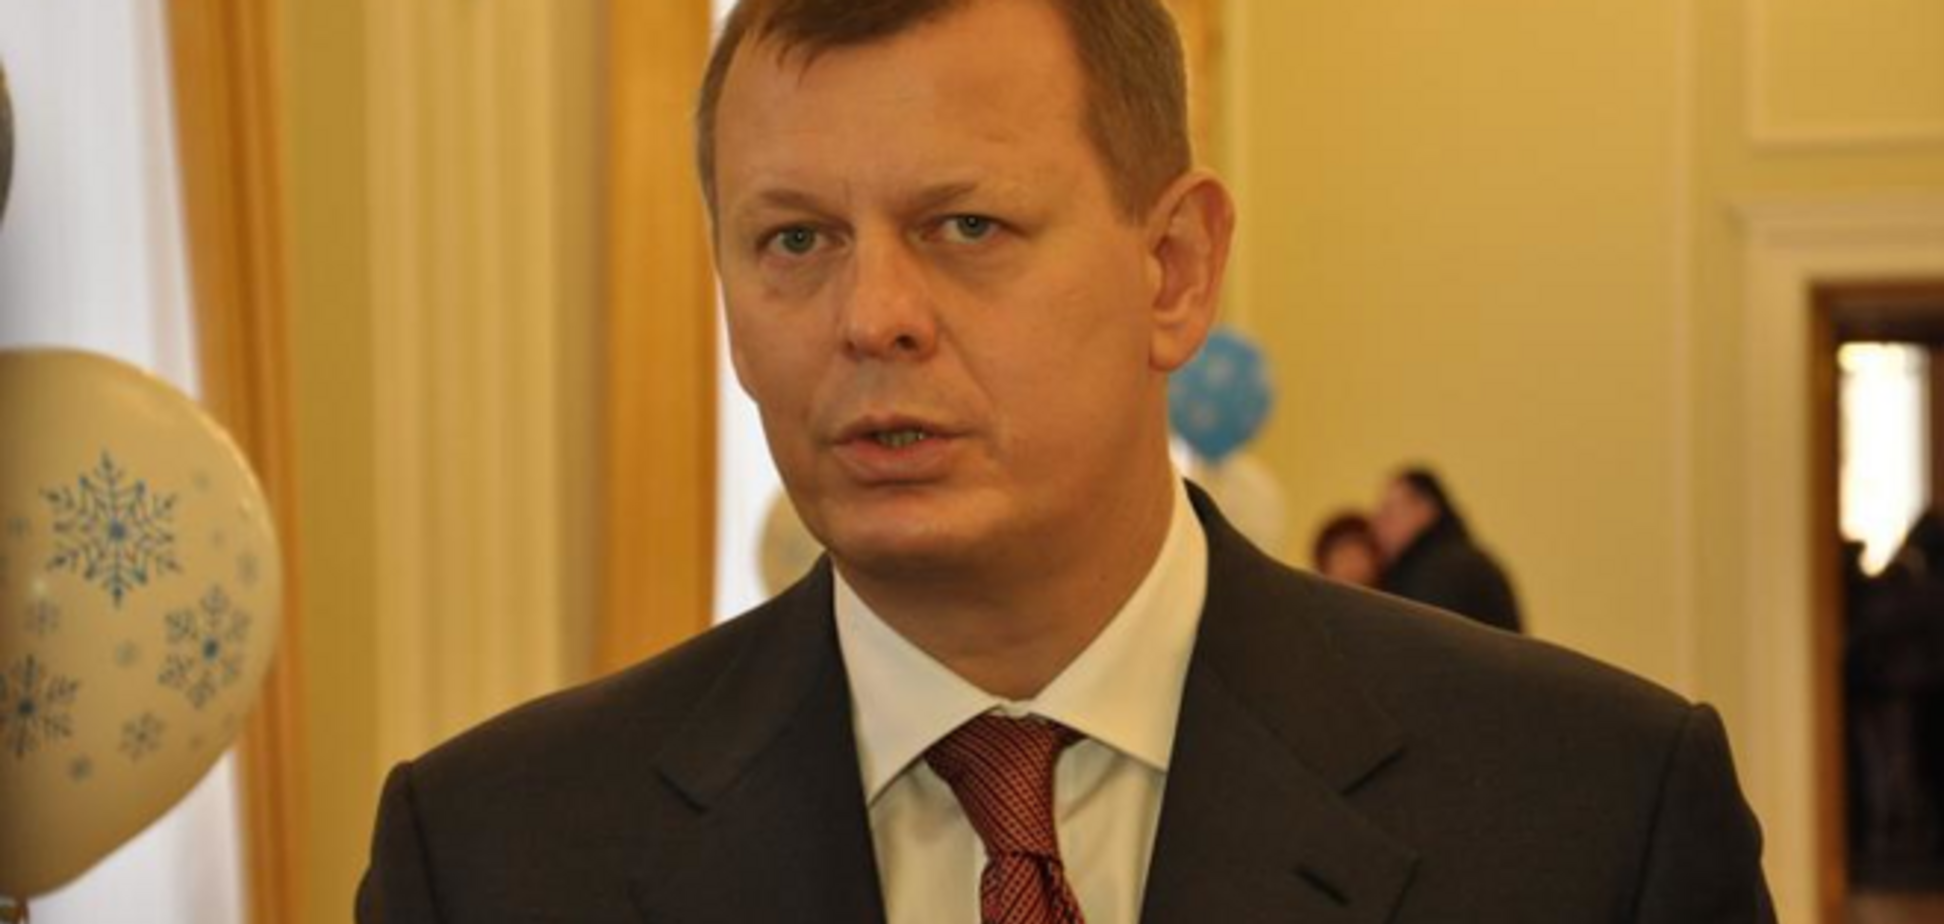 Евросоюз продлил санкции против Клюева – Шокин